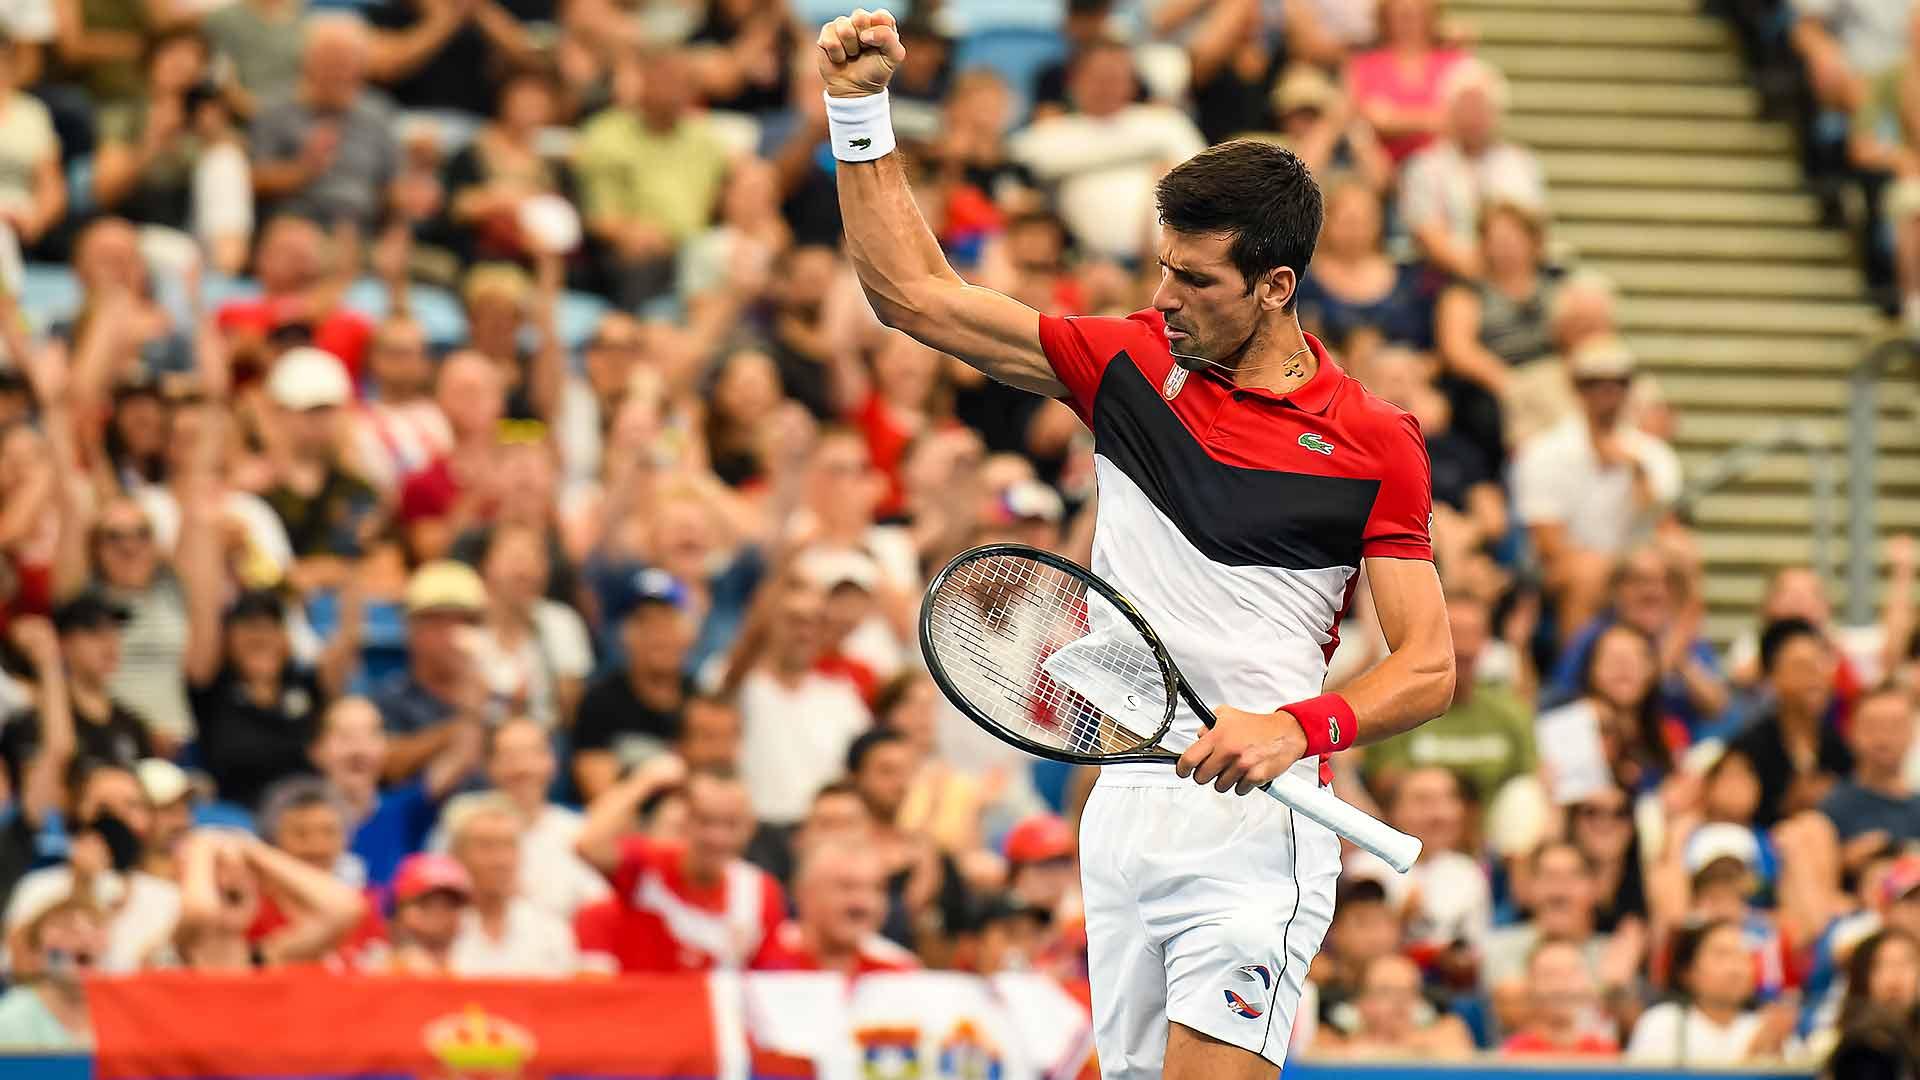 Novak Djokovic On Atp Cup Environment I Cherish These Moments Atp Tour The Union Journal